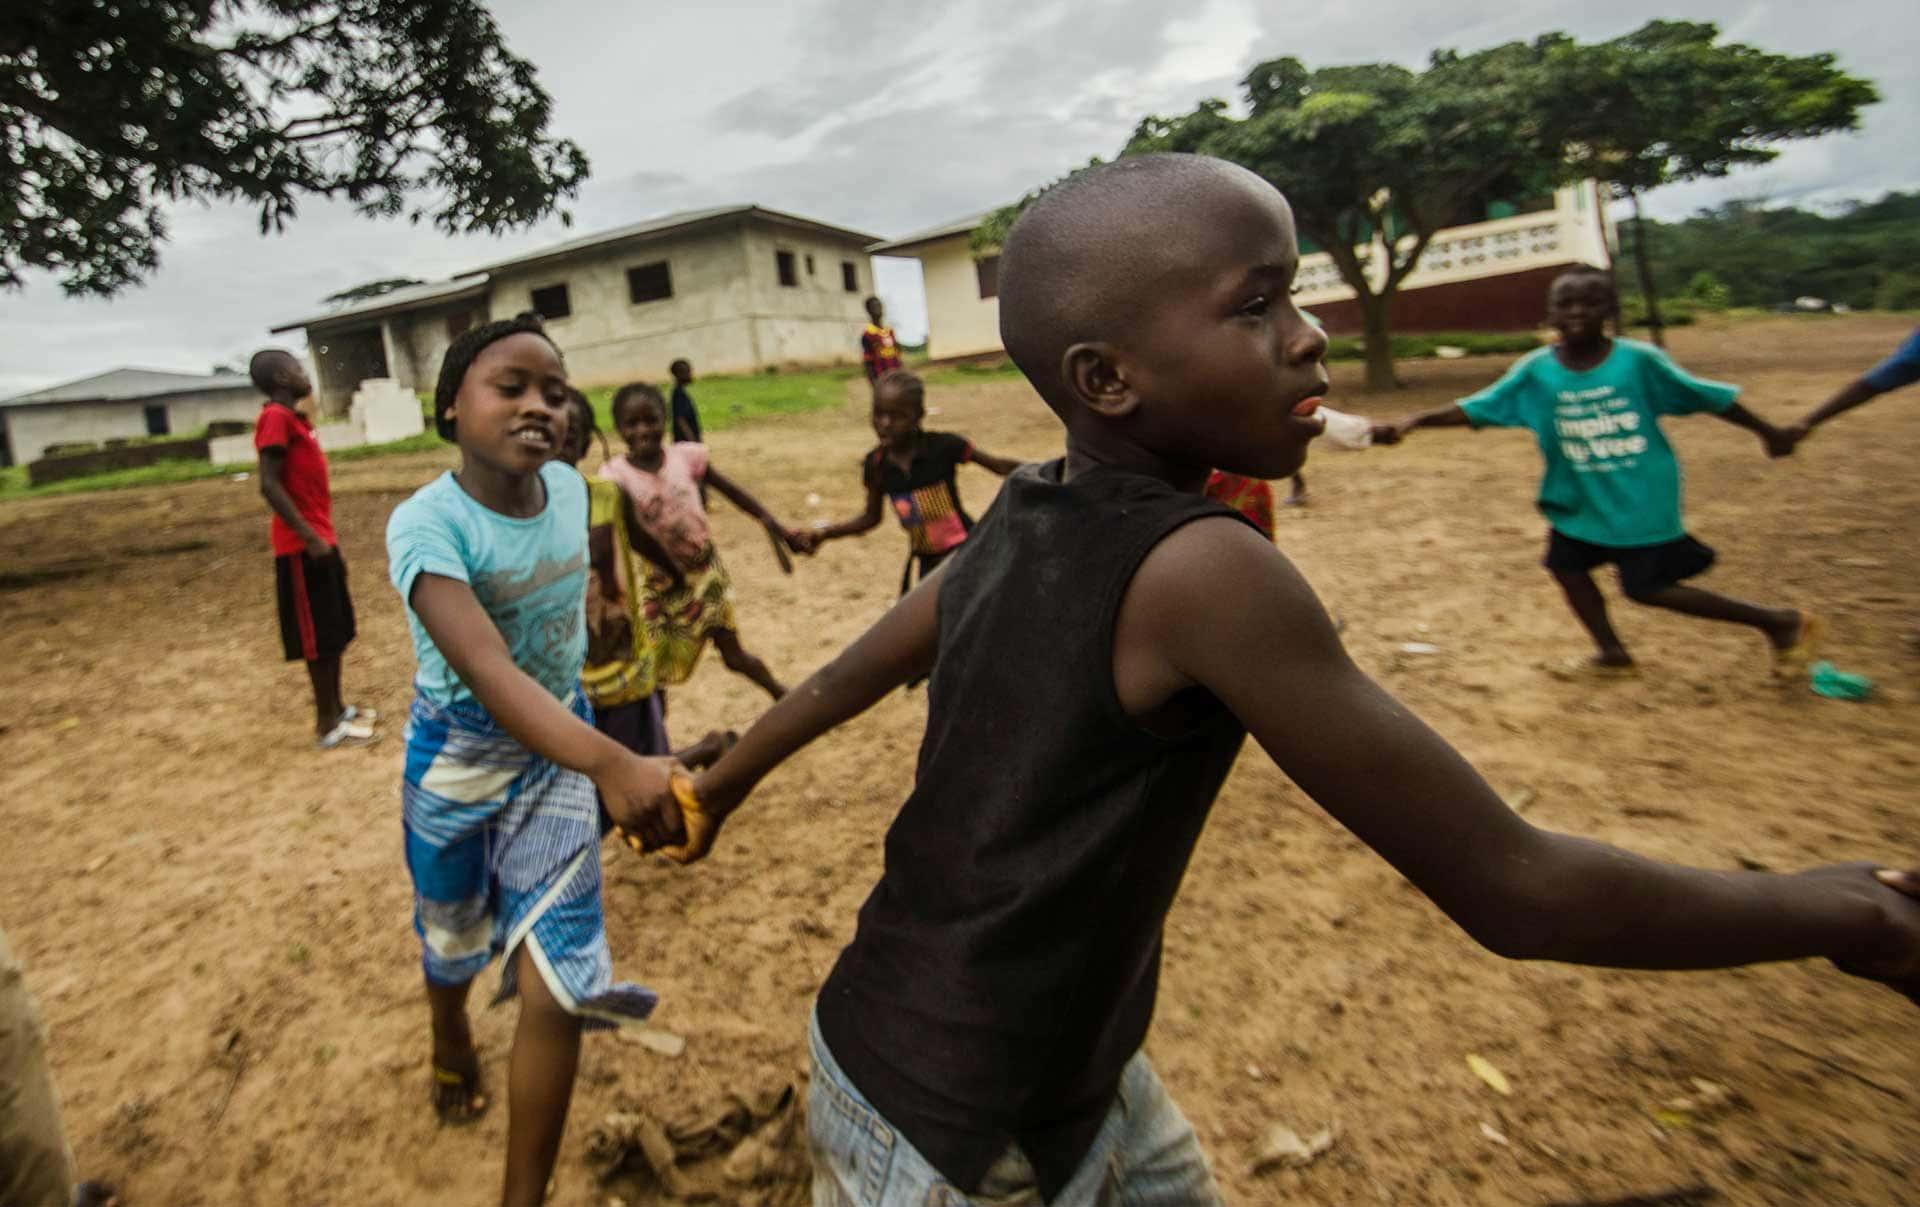 children playing in a village